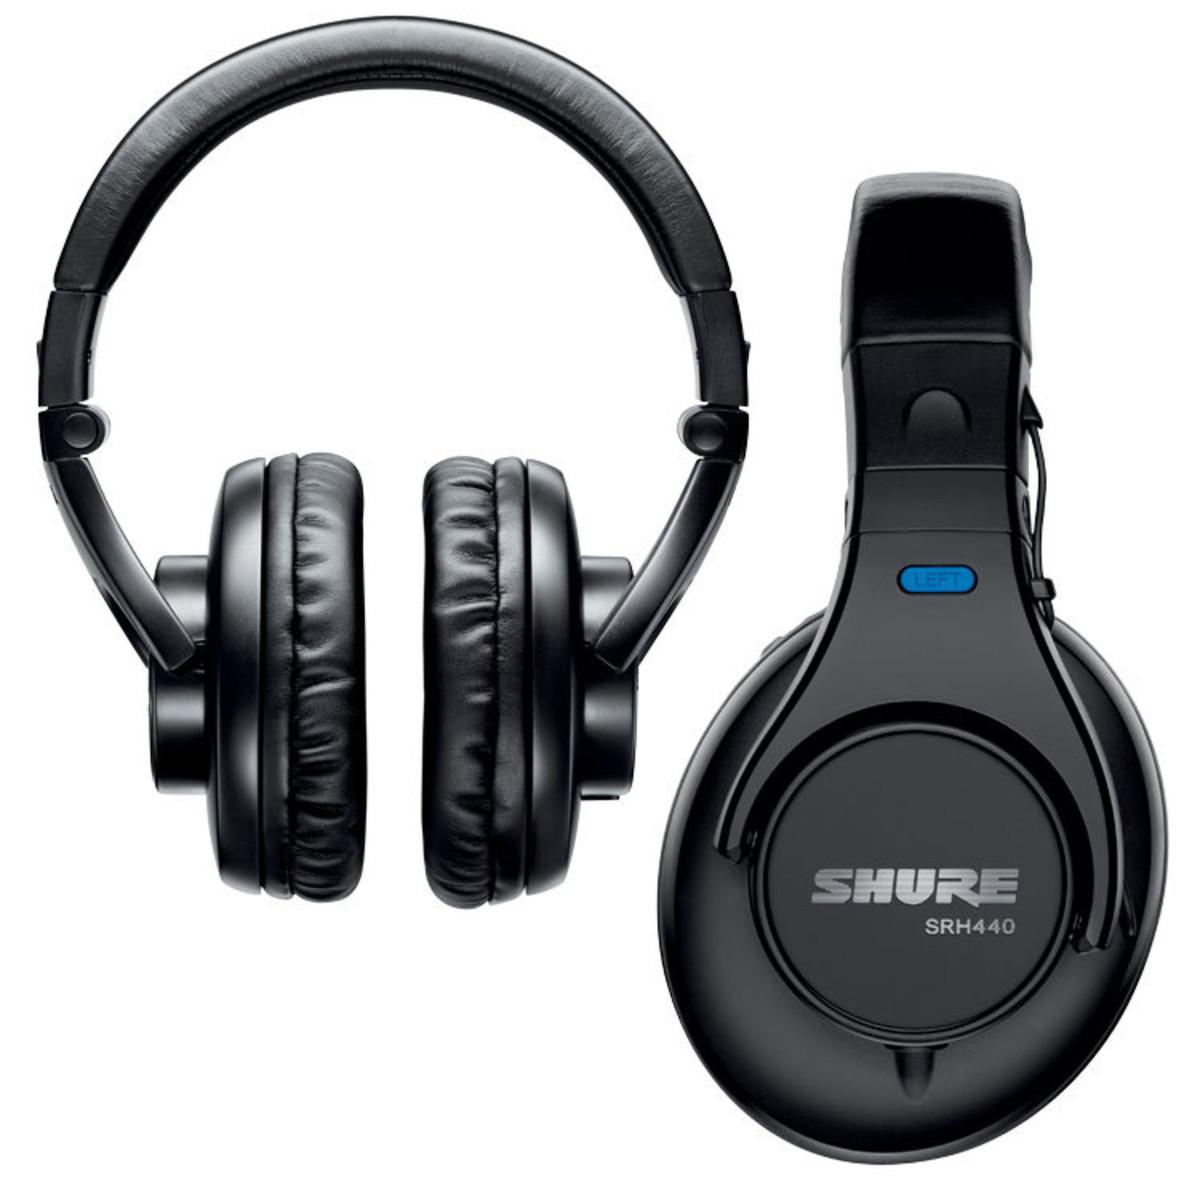 9b3d6ab65cf Shure SRH440 Professional Headphones - Trax Music Store